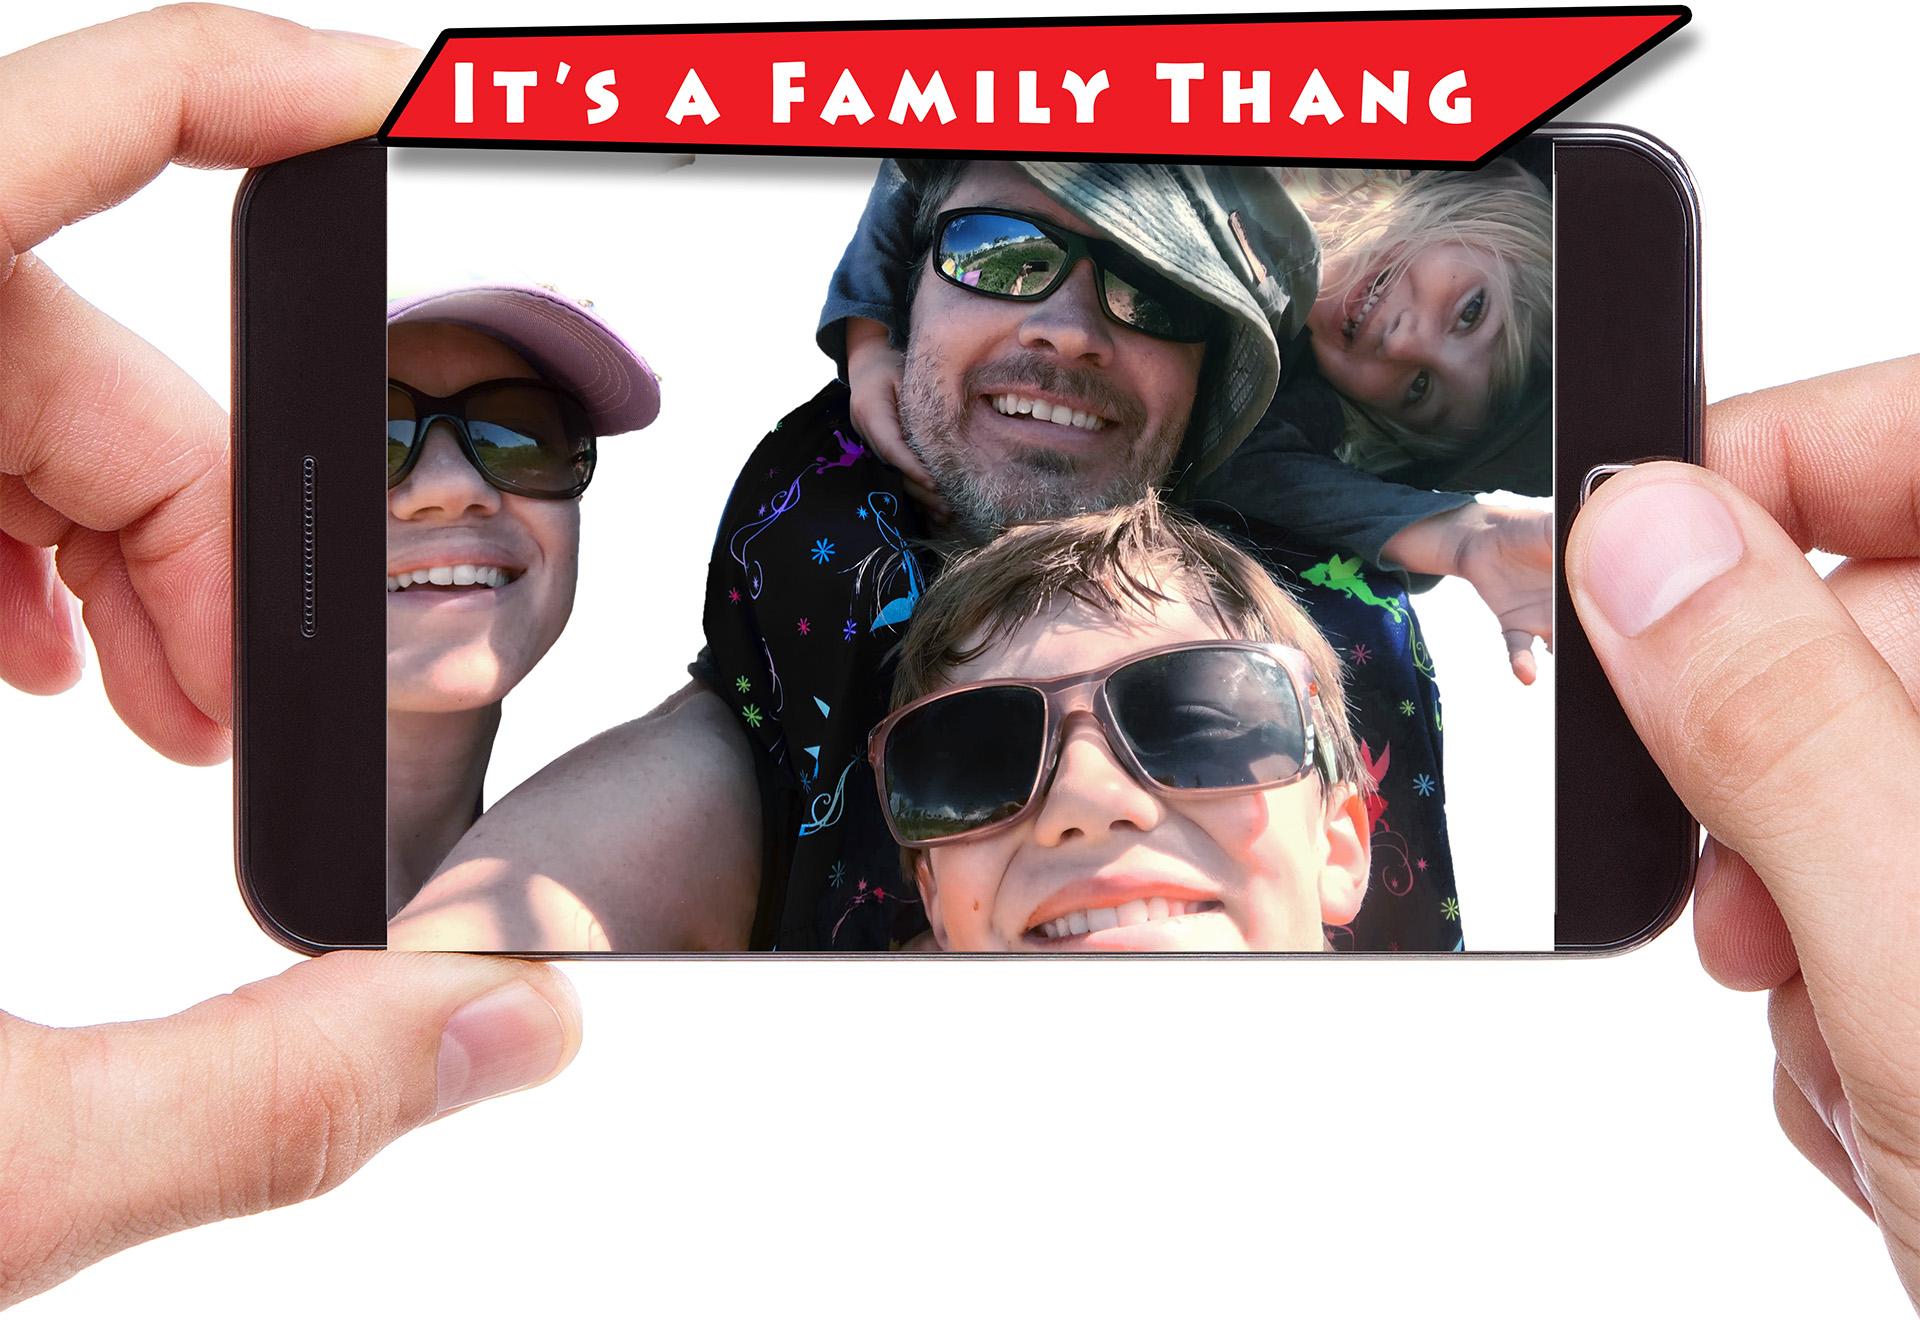 family pic 02 04sm.jpg